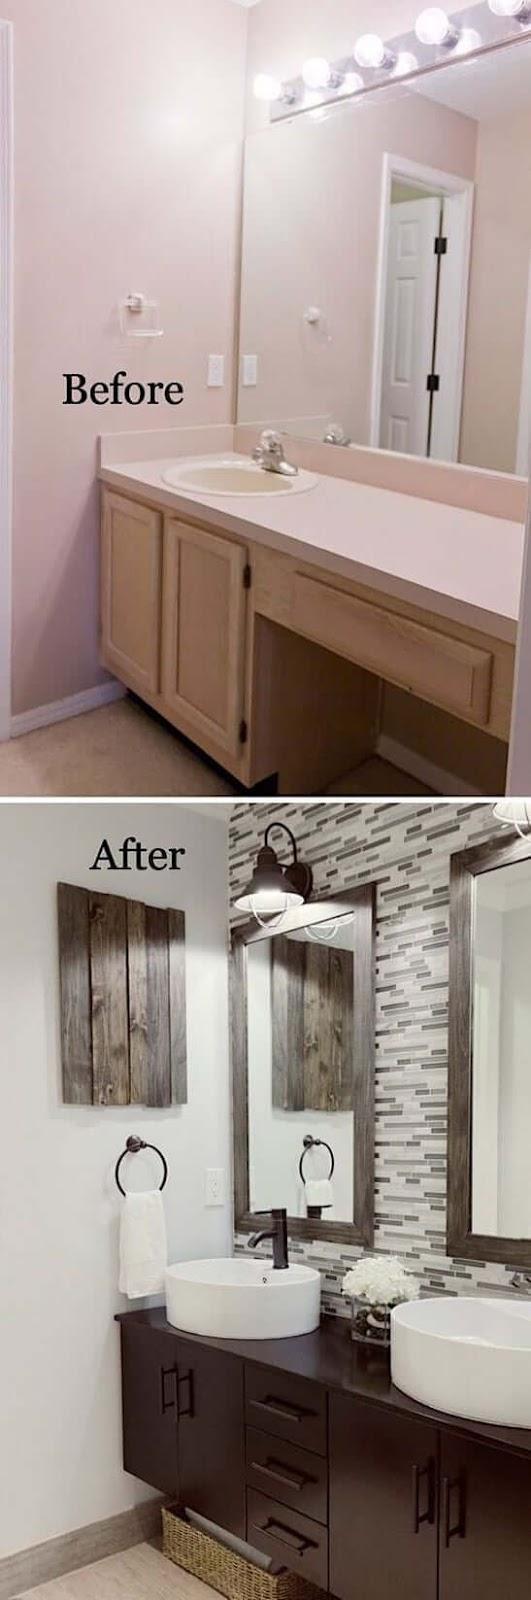 a77ea2785644de3f4eed03ef53831461 35 Low-budget Ideas to Make Your Home Look Like a Million Bucks Interior